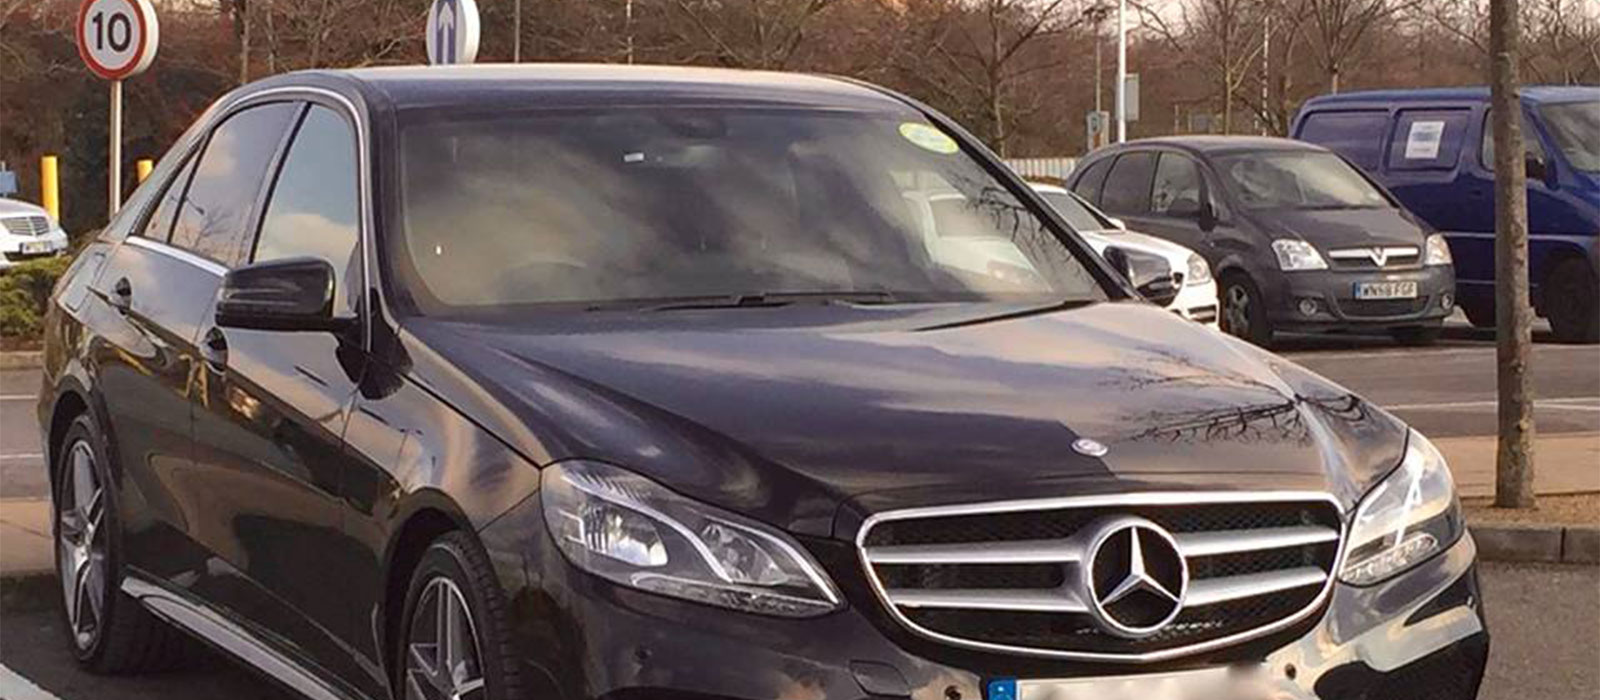 London Mercedes Benz E- Class Chauffeur Driven-car Hire Services